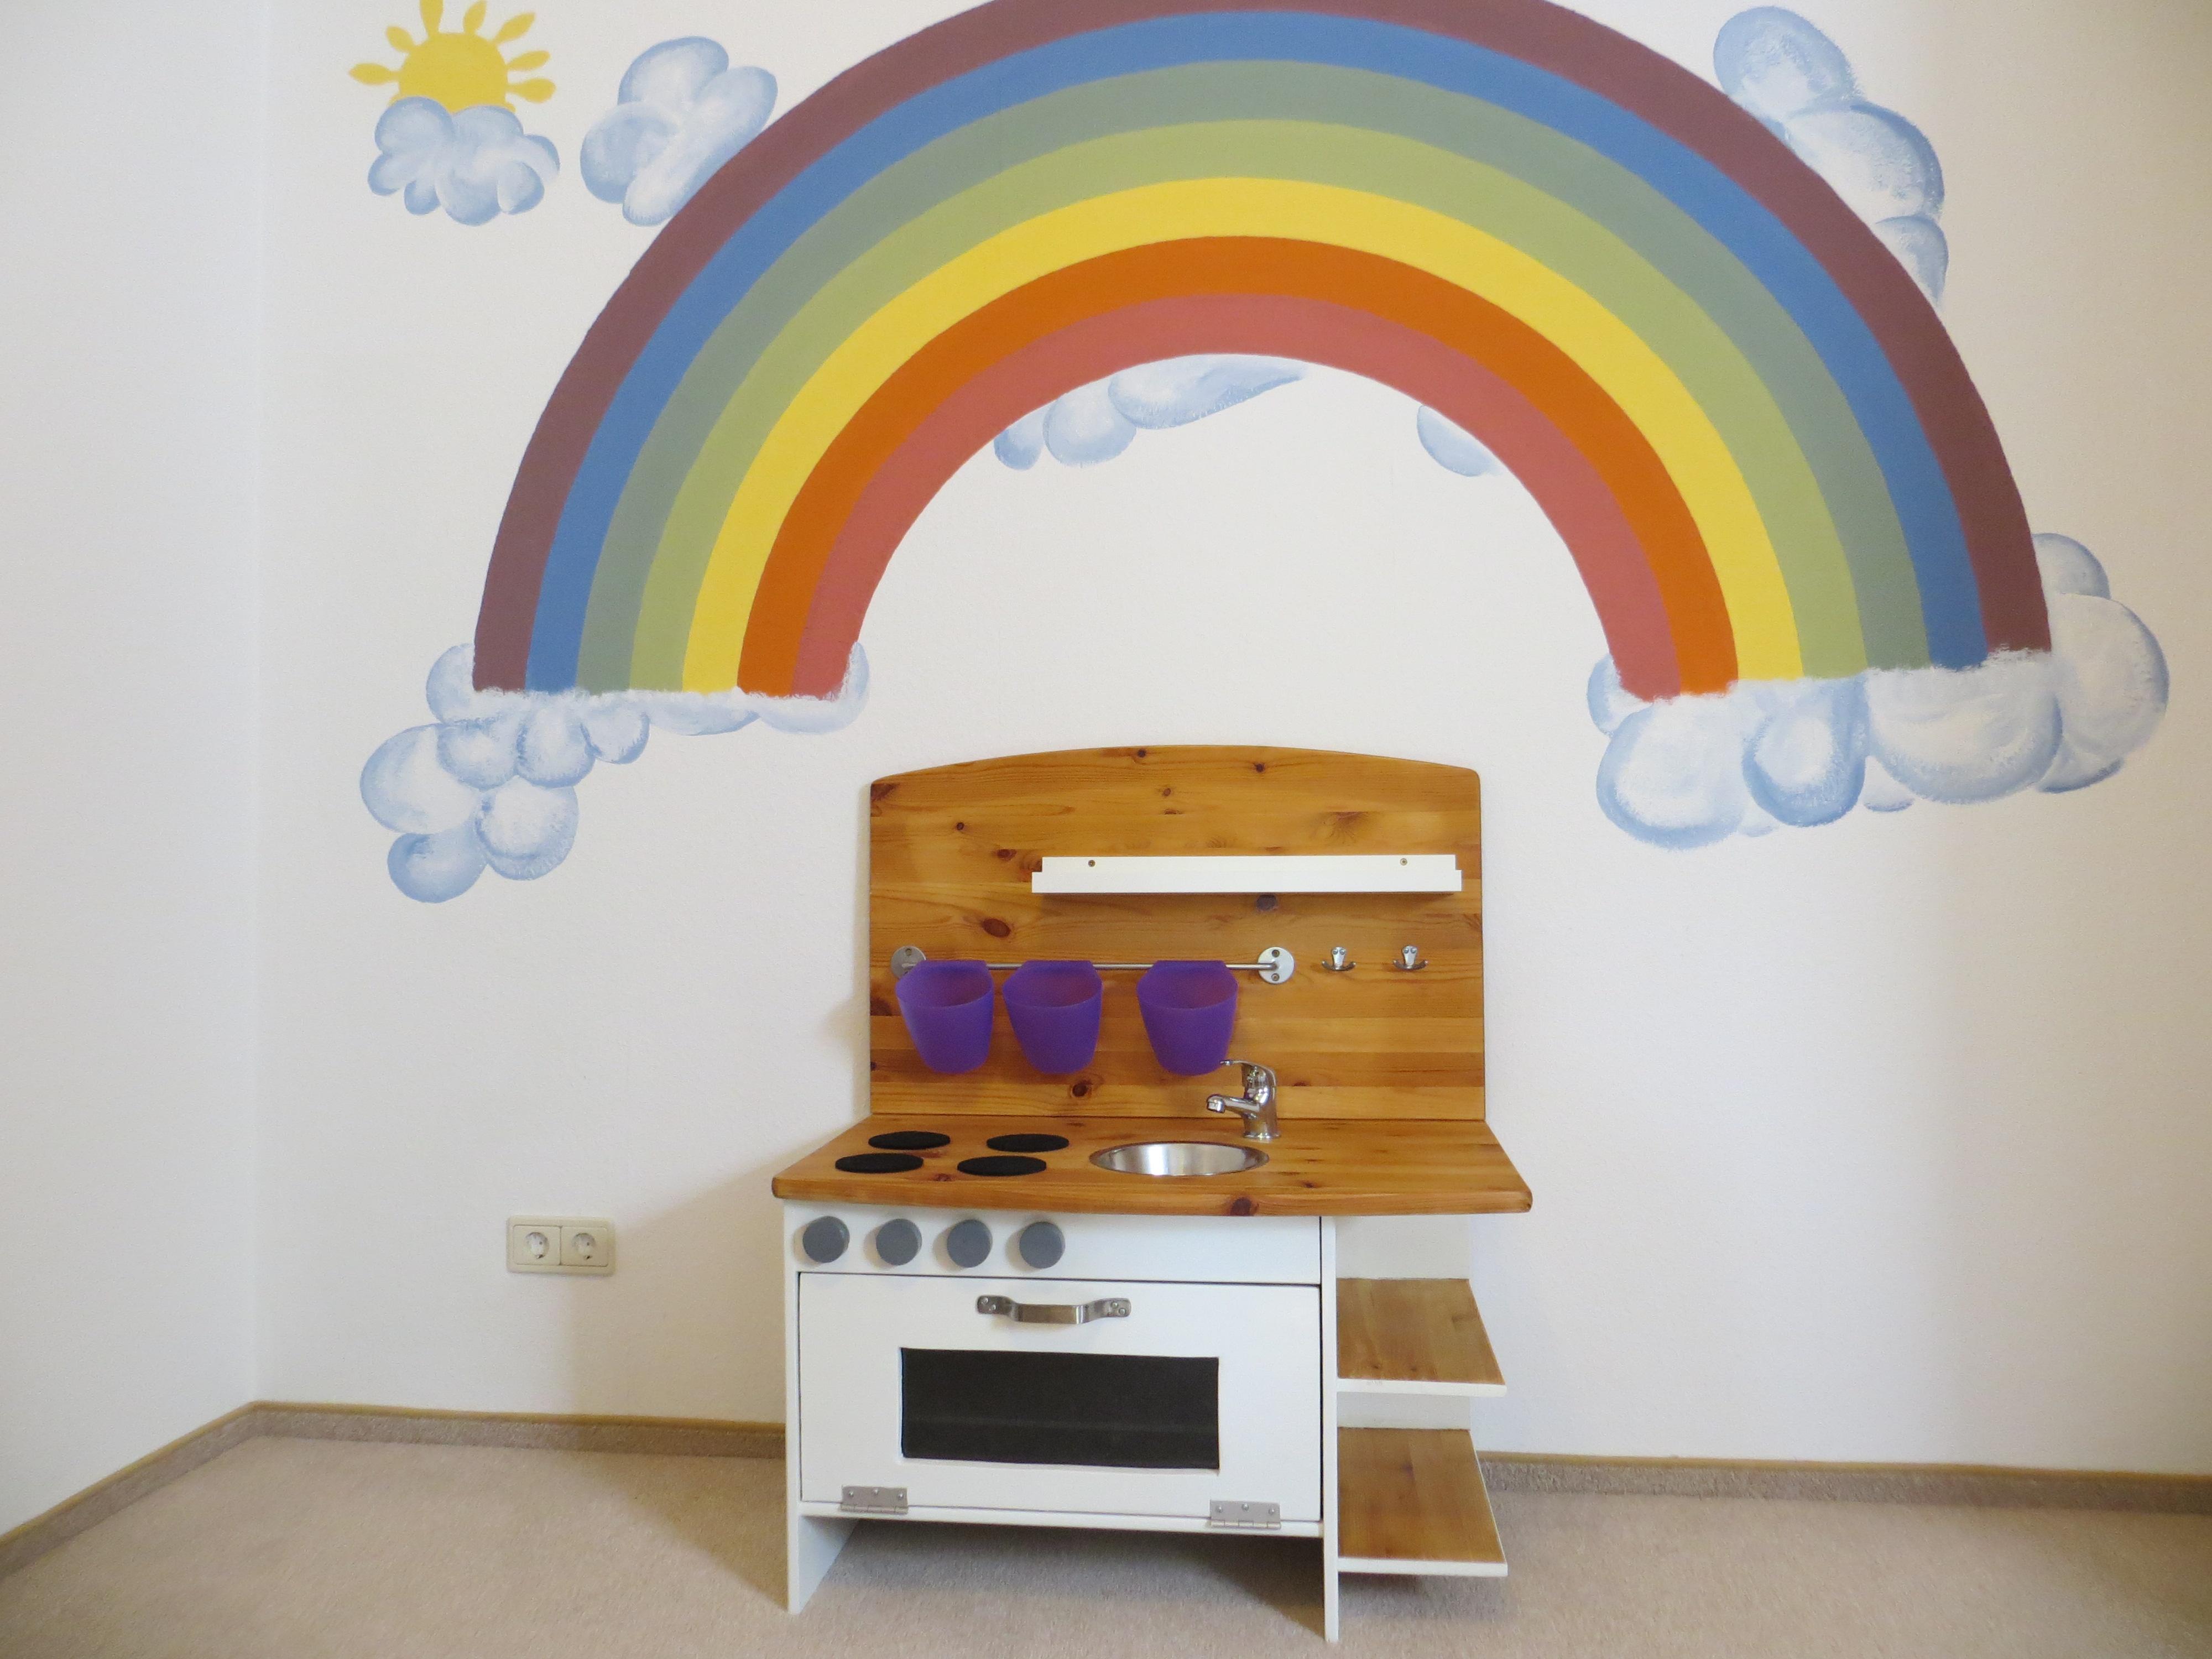 kinderküche aus tv schrank gebaut | userprojekte | selbst.de - Kinder Küche Selber Bauen